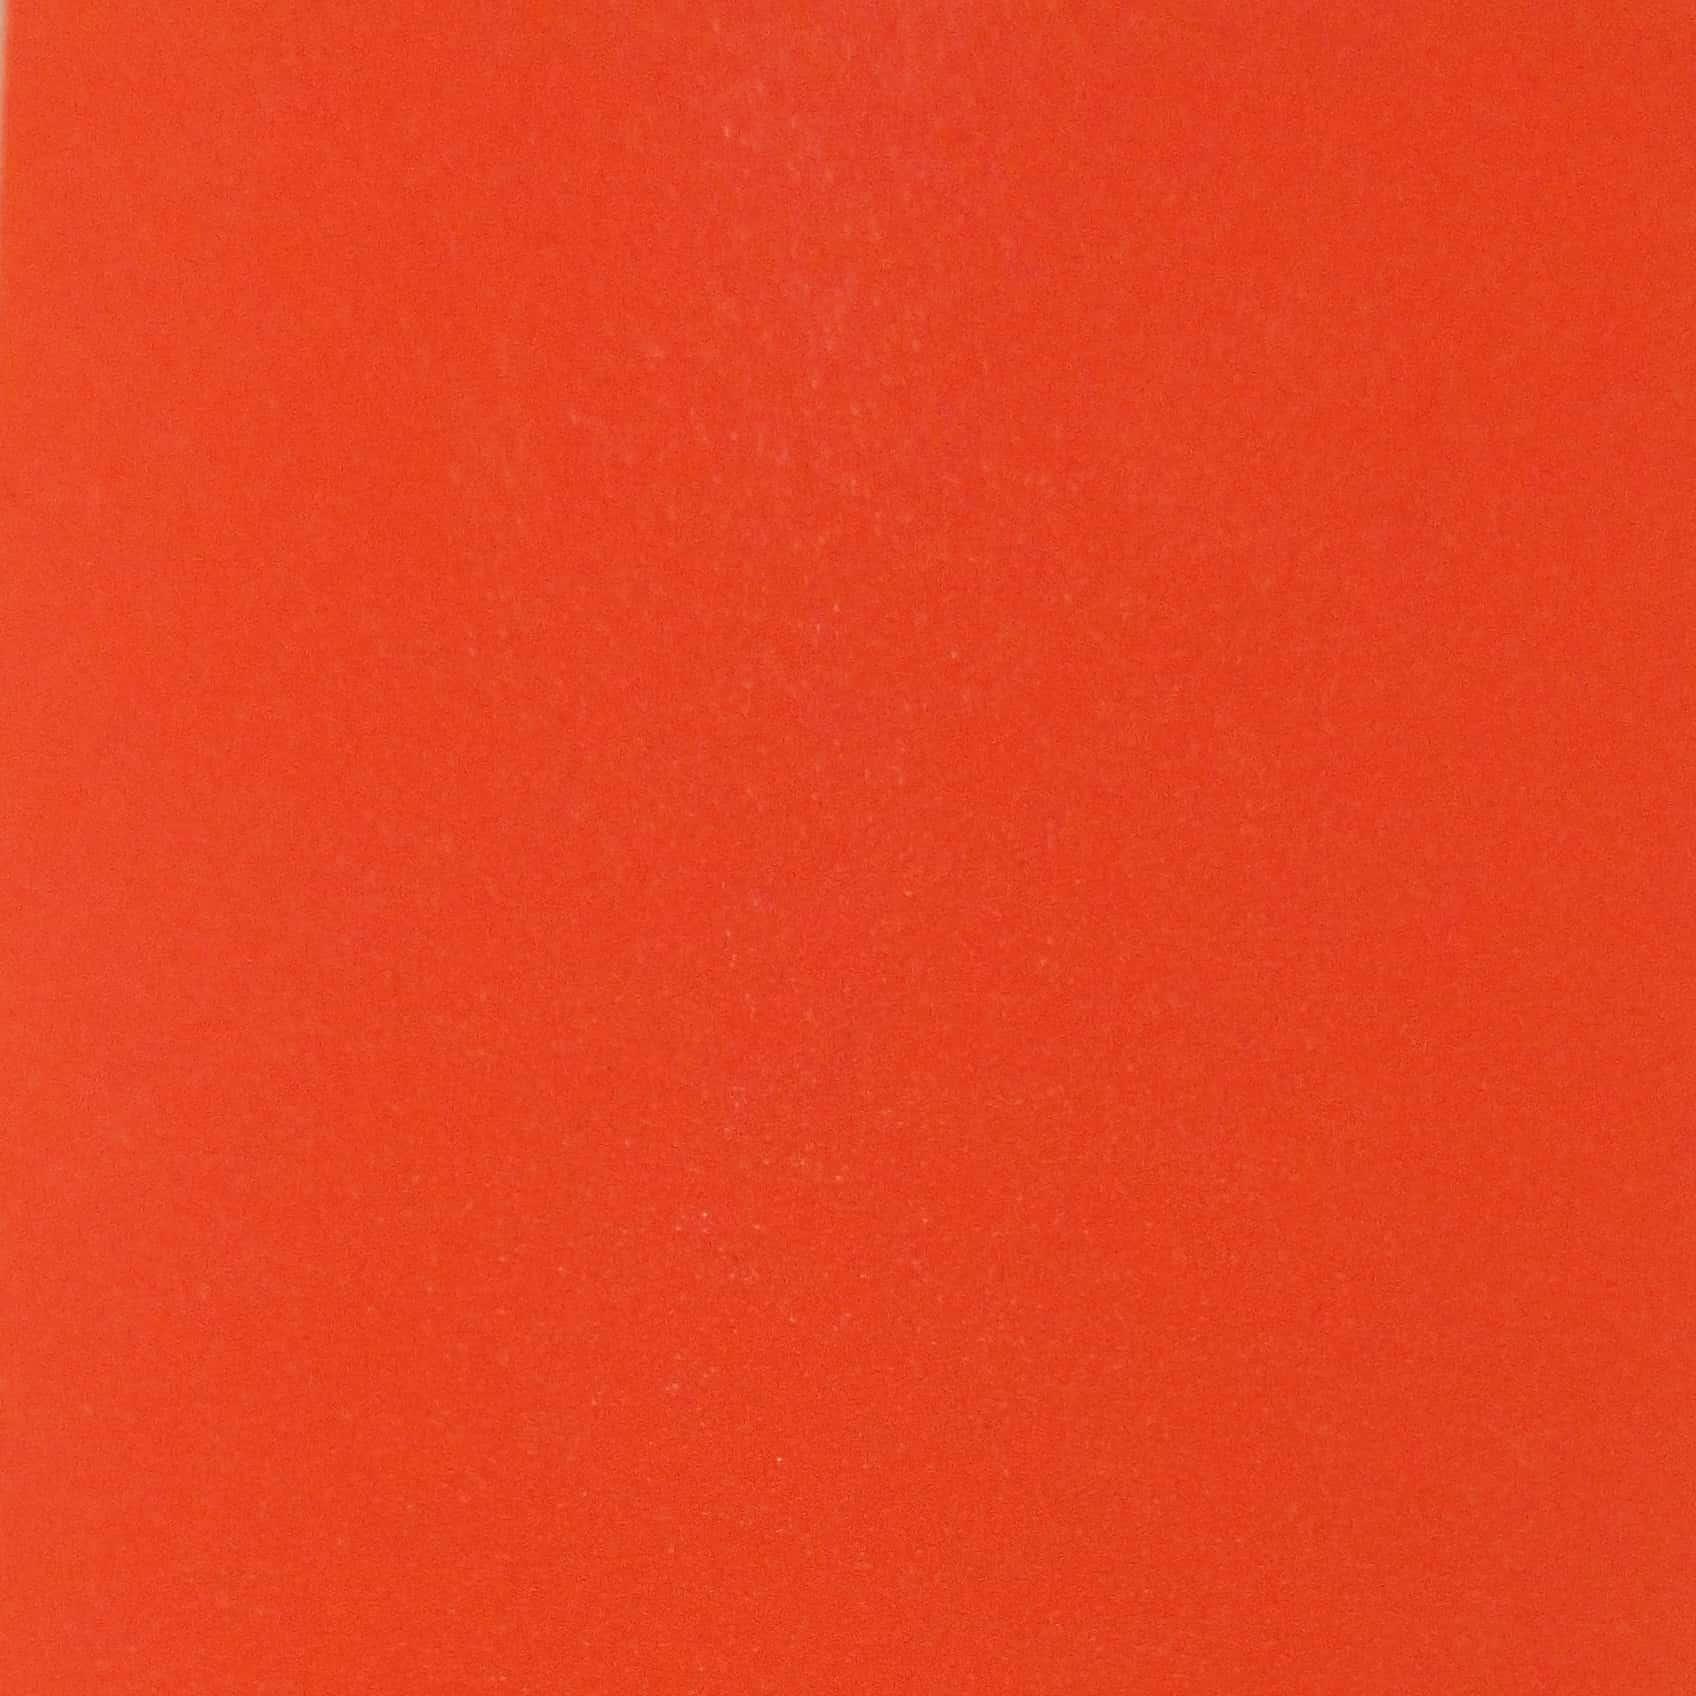 FireDex Options - 3M Scotchlite Red Orange Trim